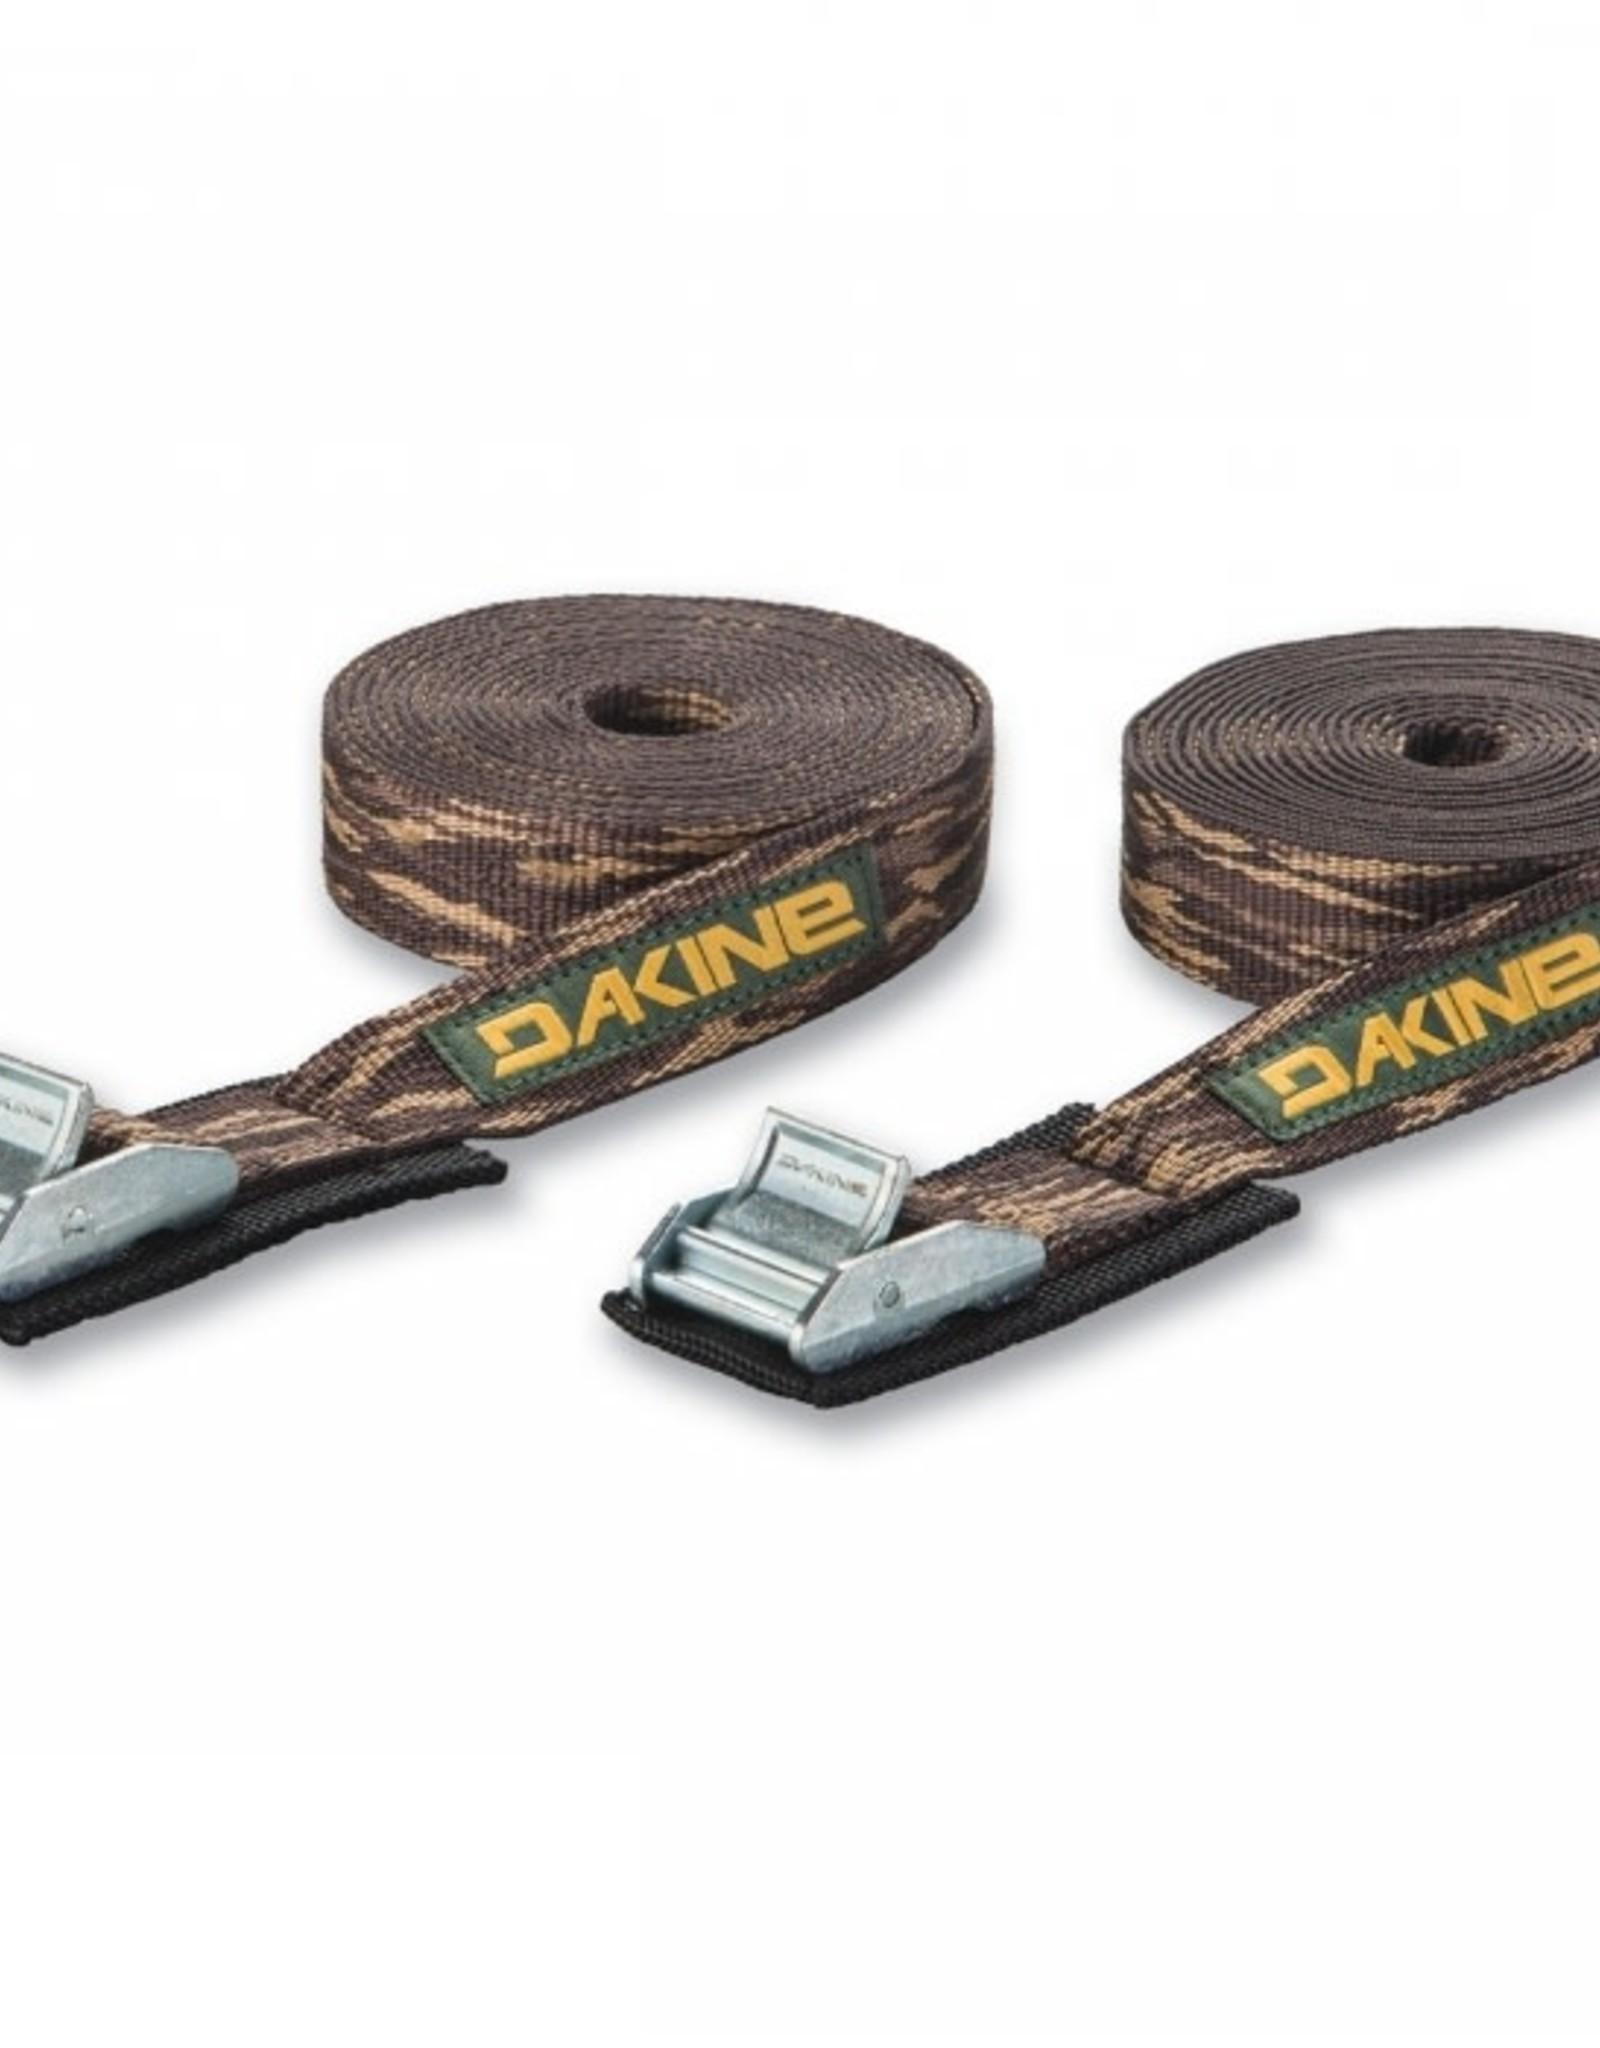 Dakine Dakine - BAJA TIE DOWN STRAPS 12' (2 pack) - Camo